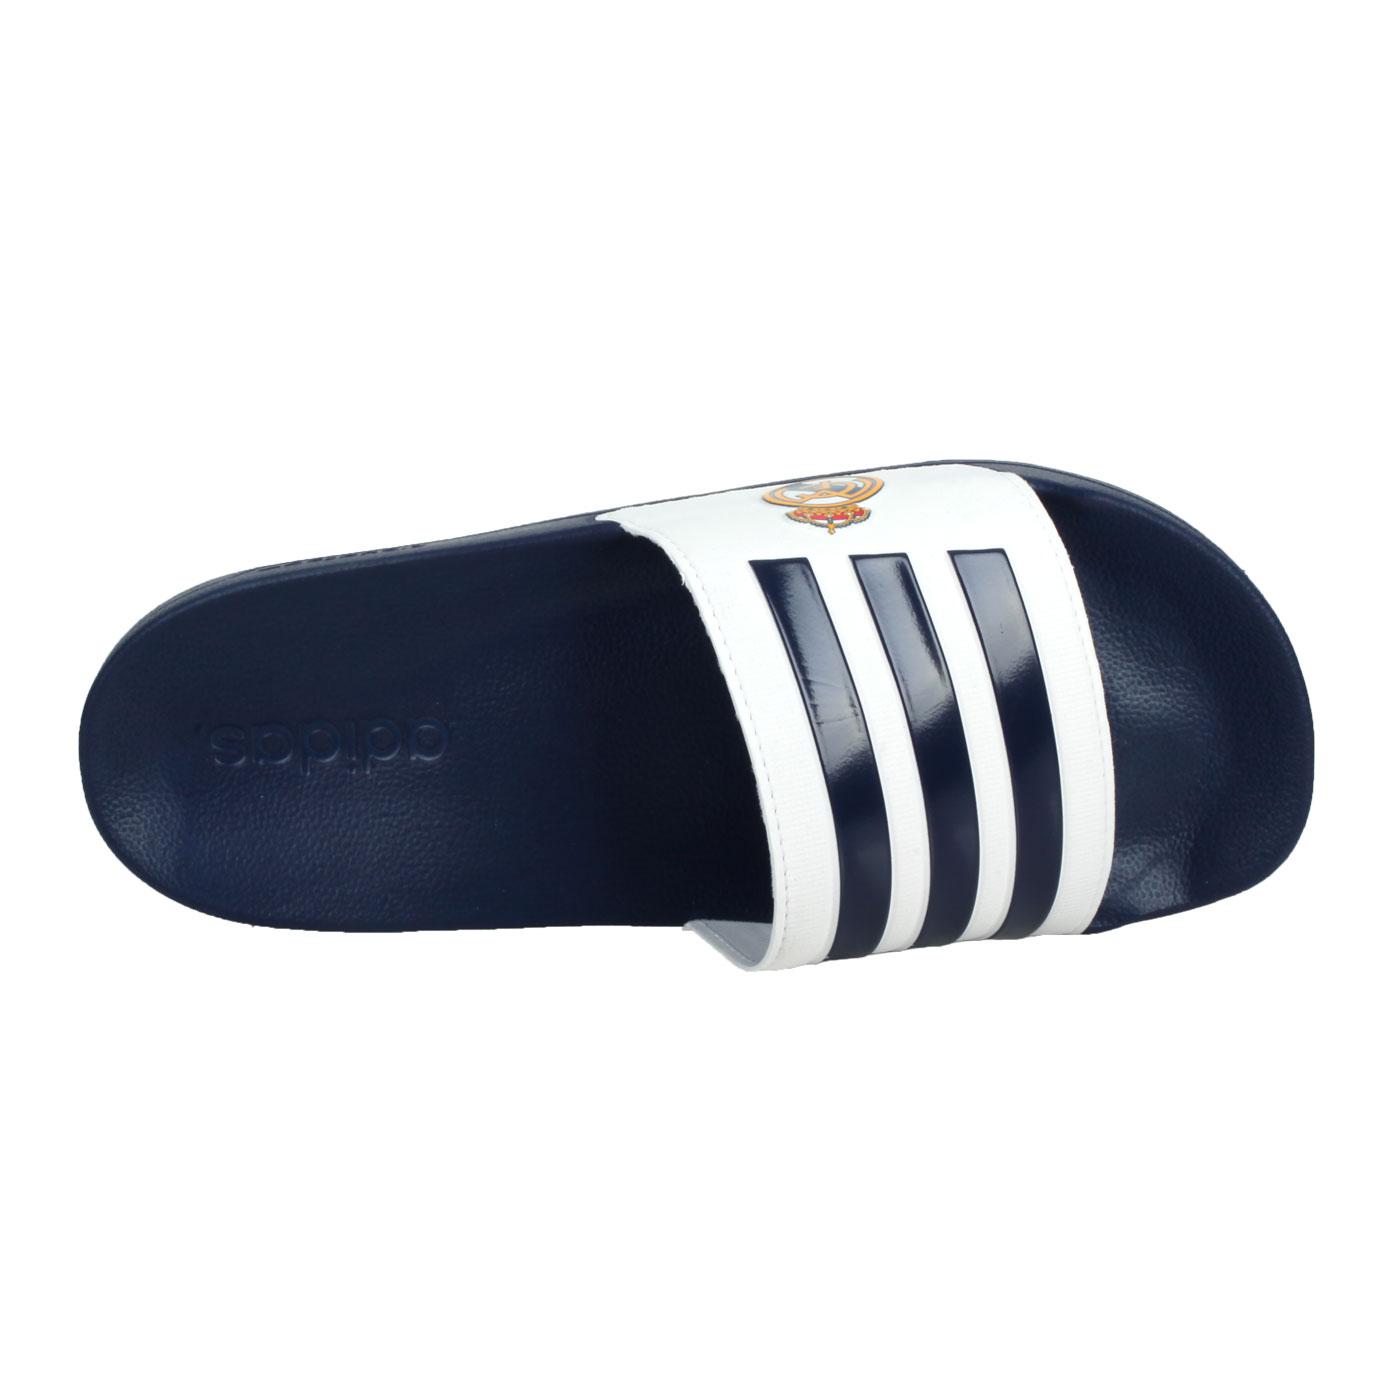 ADIDAS 運動拖鞋-皇家馬德里 FW7073